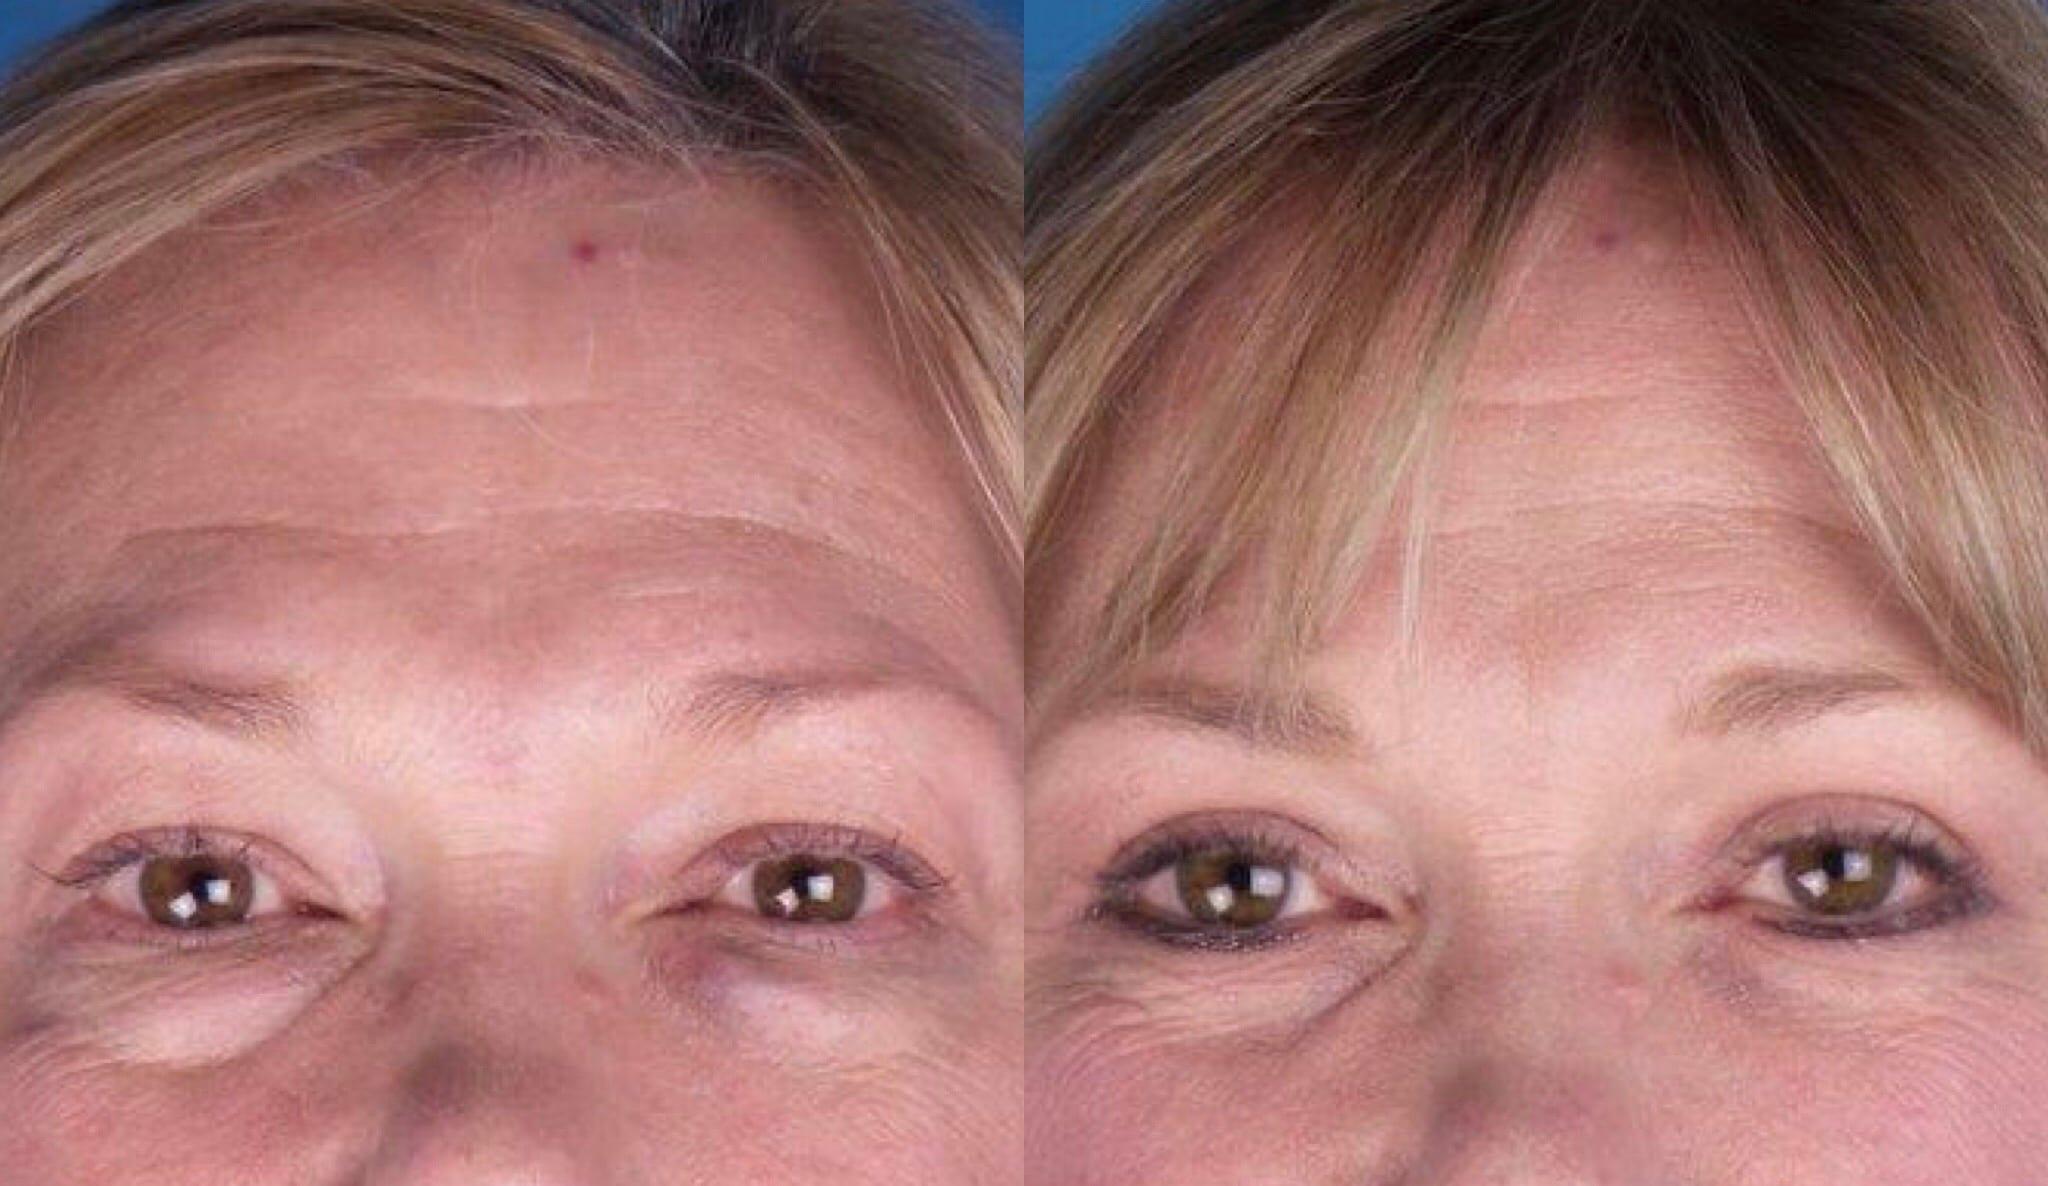 Blepharoplasty/Eyelid Surgery in Atlanta, GA